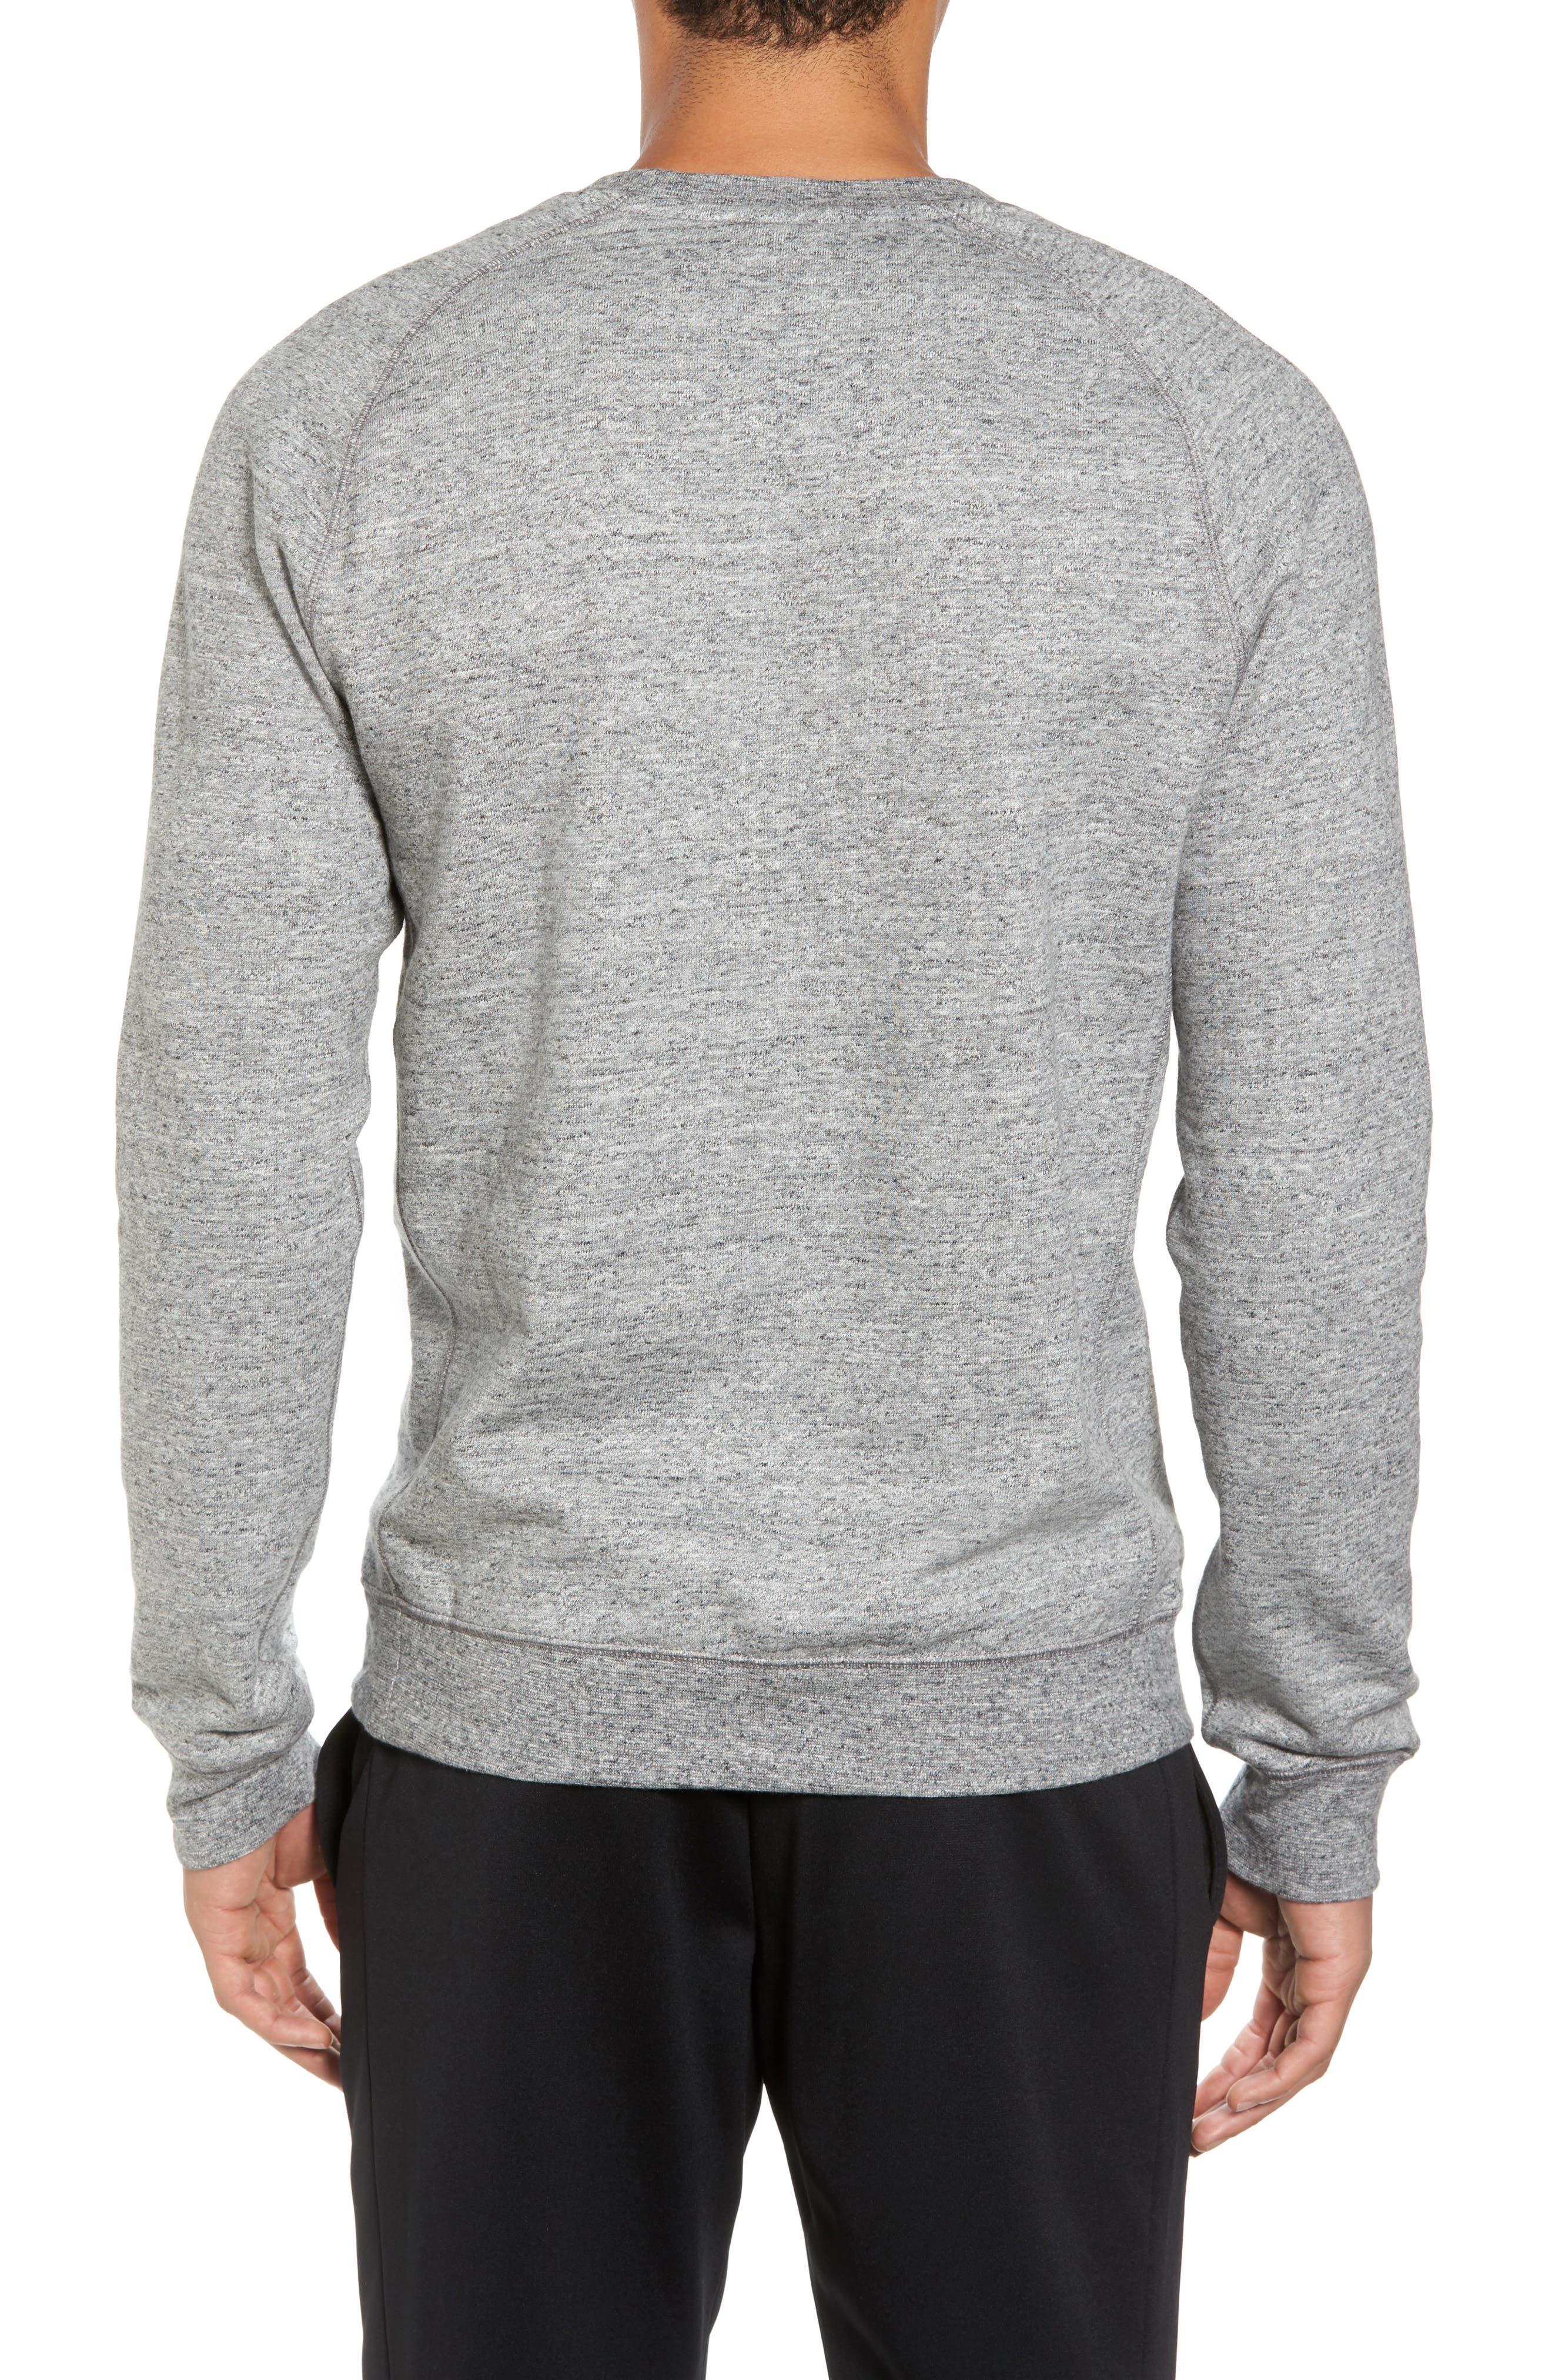 Legacy Raglan Crewneck Sweatshirt,                             Alternate thumbnail 2, color,                             092